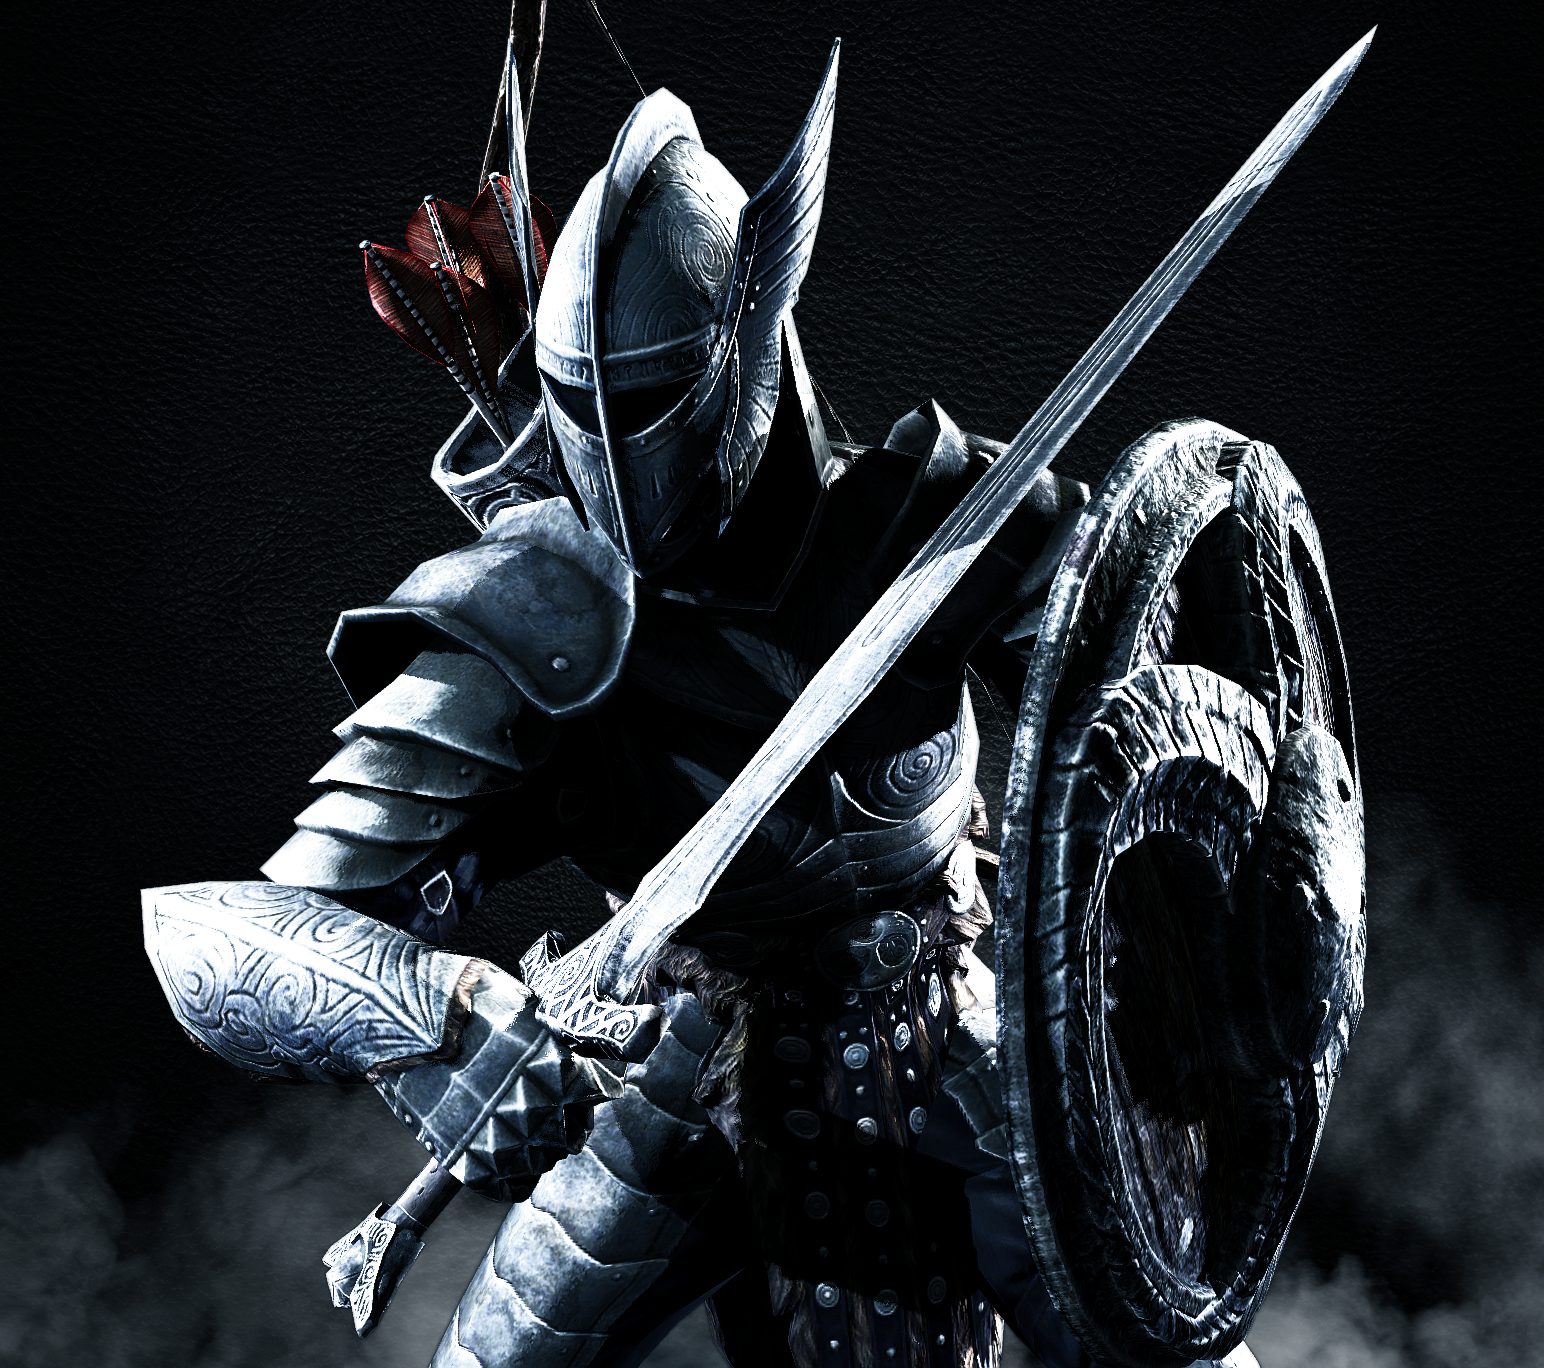 A Nordic Knight by LordHayabusa357